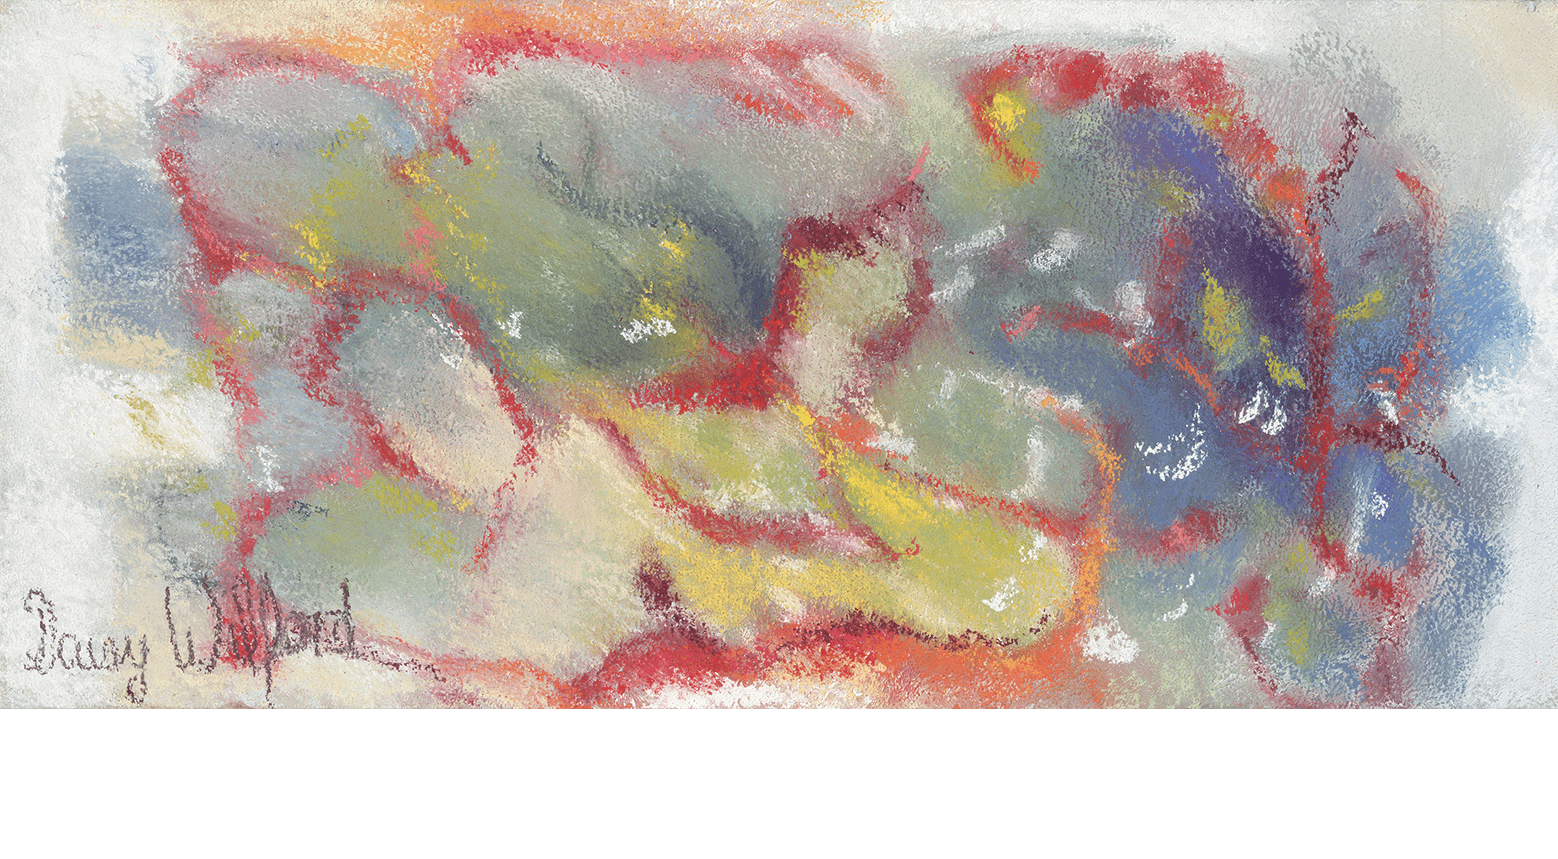 Joie et rythme (1987)